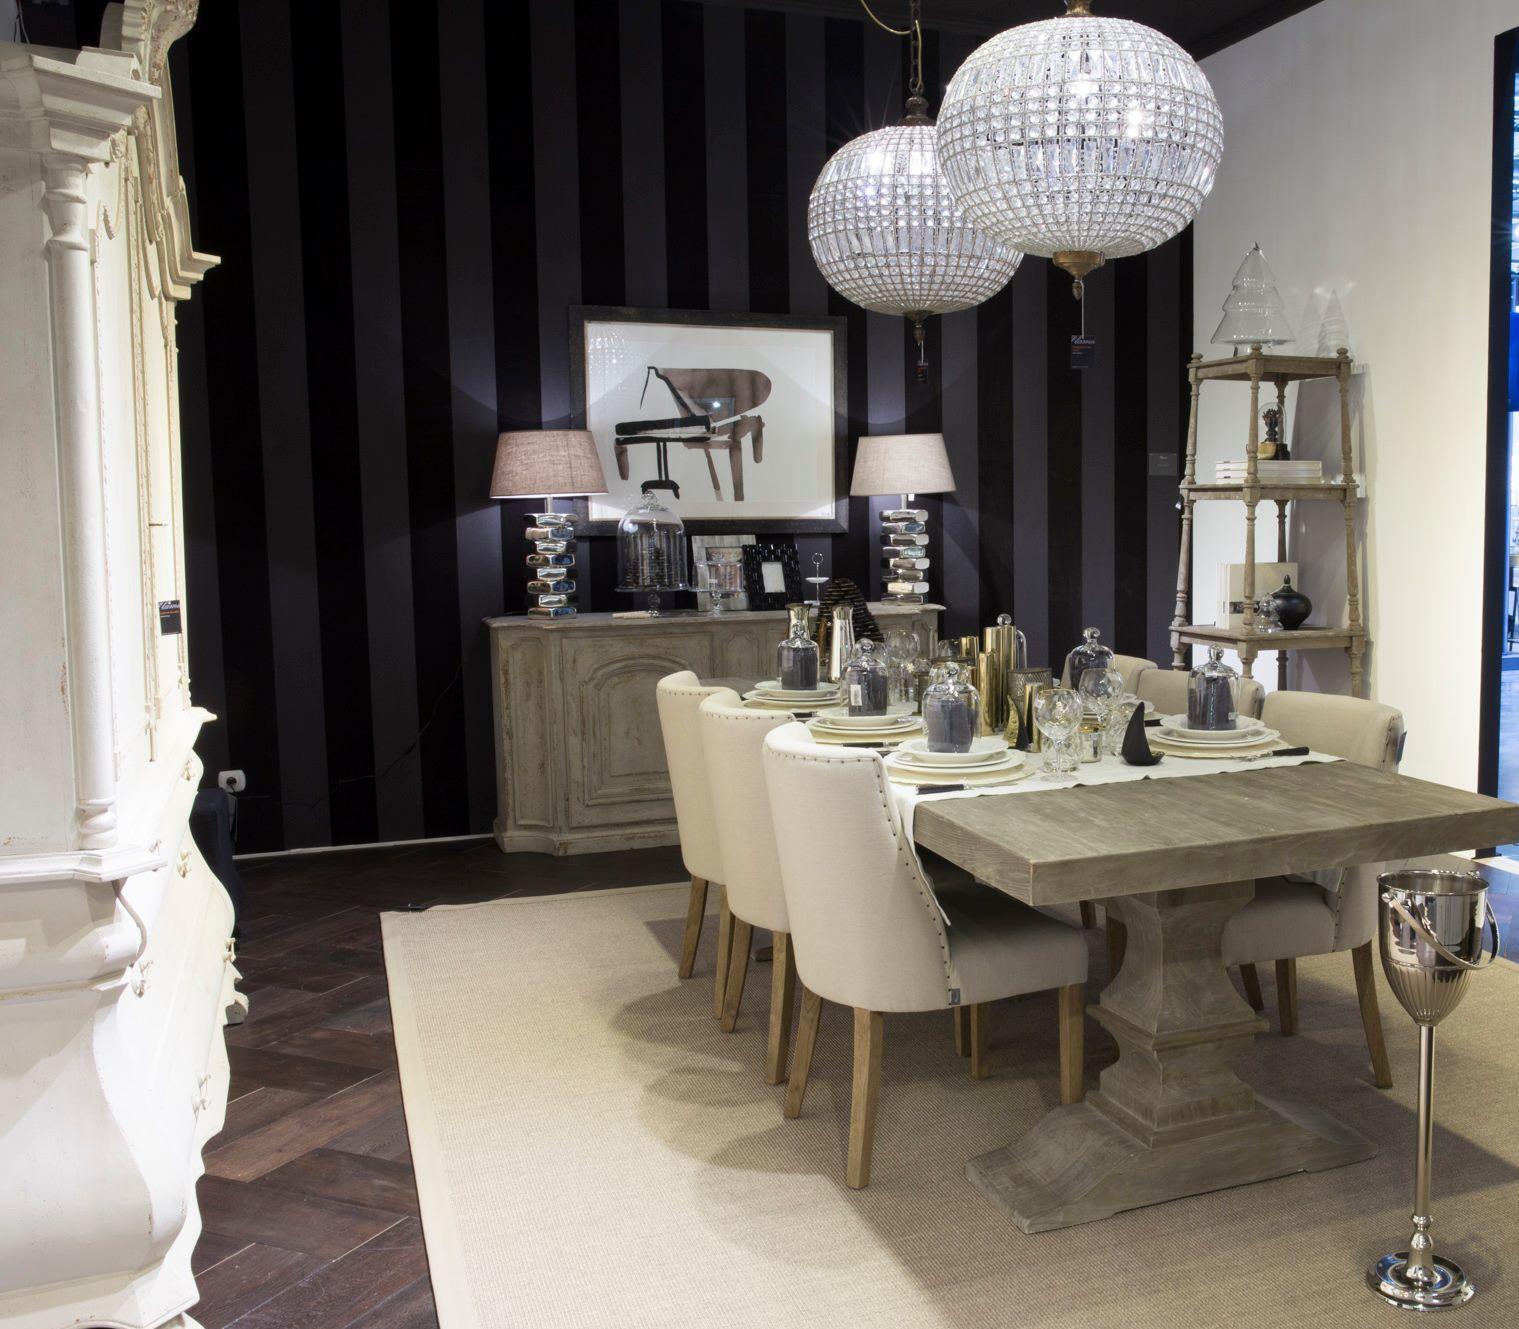 Boiserie c sale pranzo dining room sala da pranzo dining room dining e room - Sale da pranzo contemporanee ...